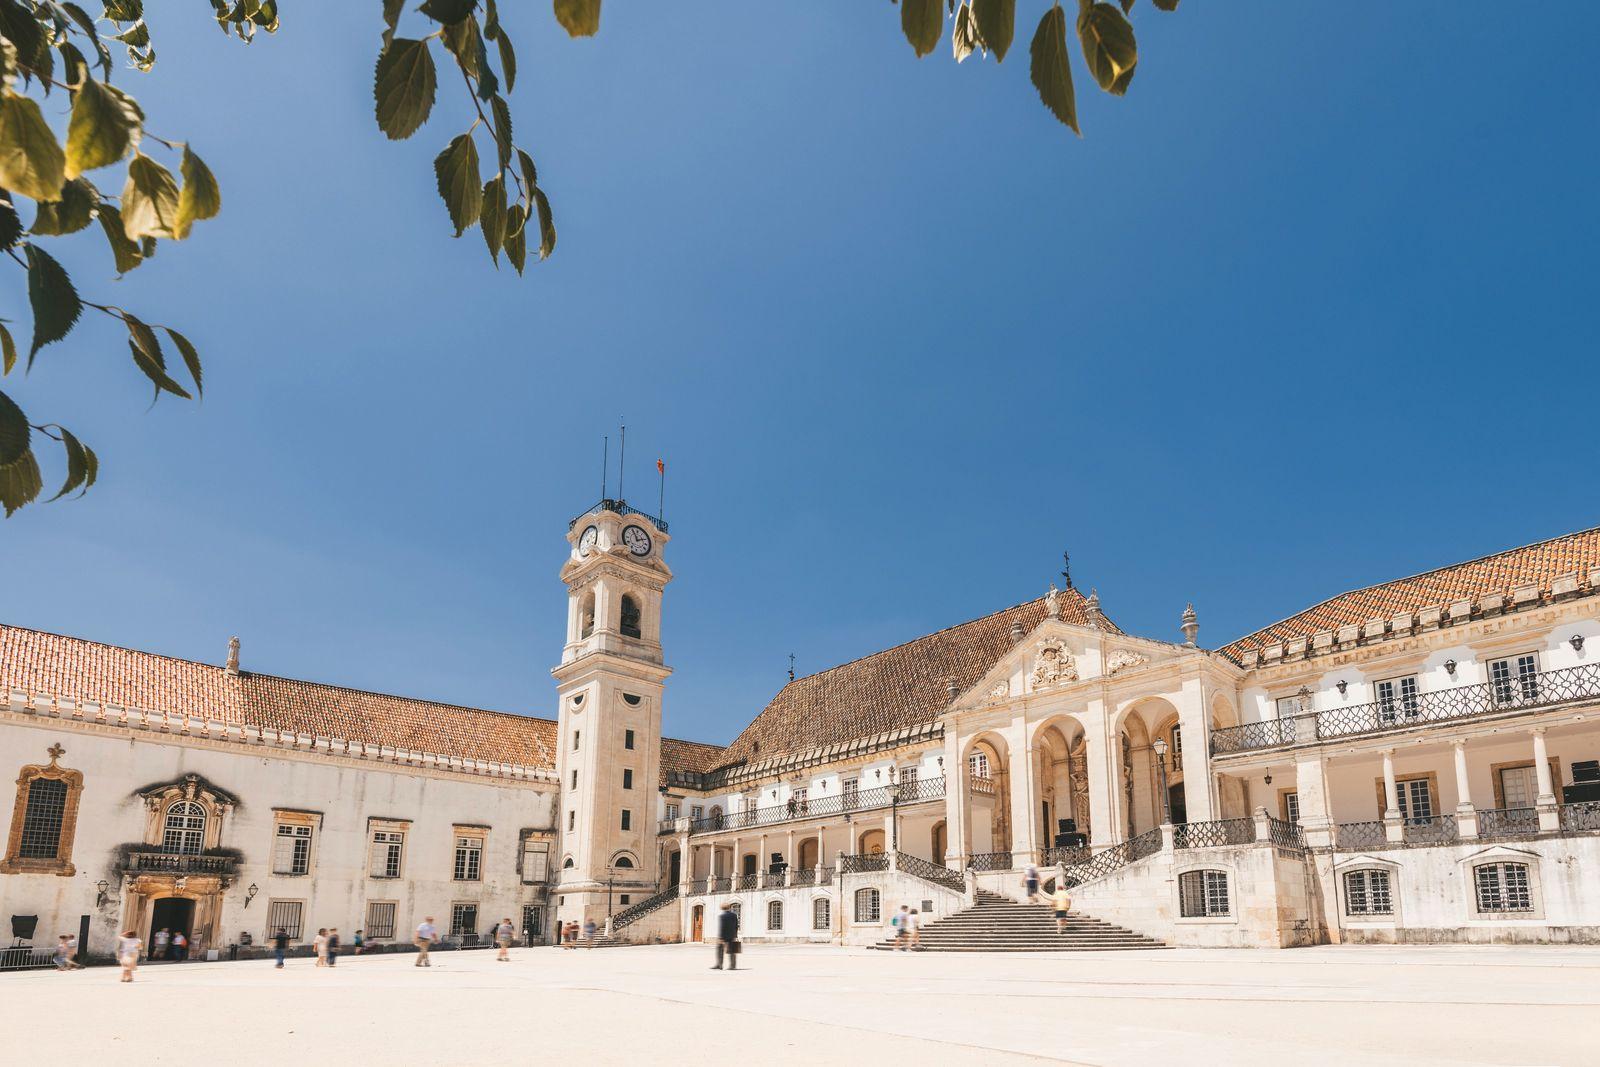 A cultural journey through Coimbra, the former Portuguese capital